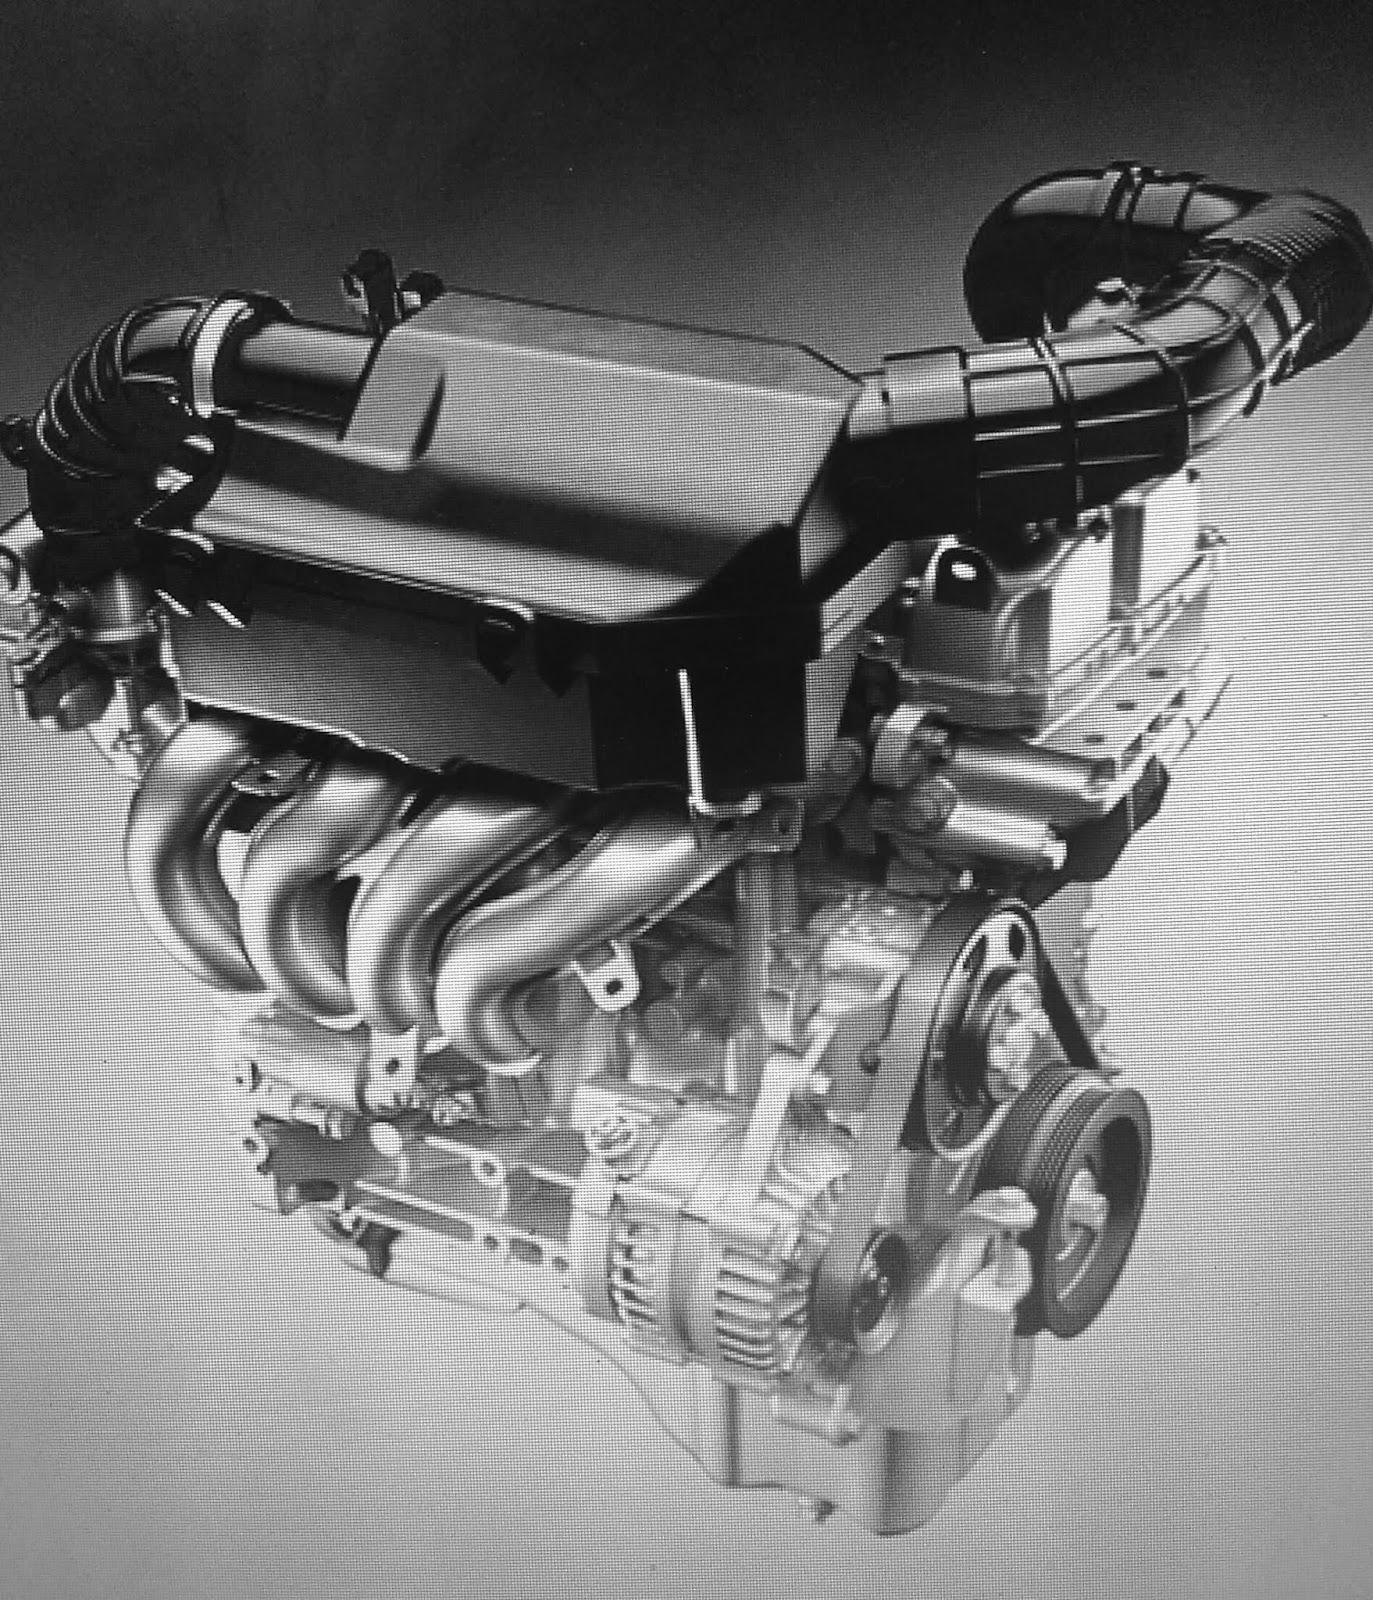 medium resolution of wagonr most selling car in maruti suzuki last 2013 wagonr has k series 998cc three cylinder engine this car has bsvi engine this car have 20 22kmpl